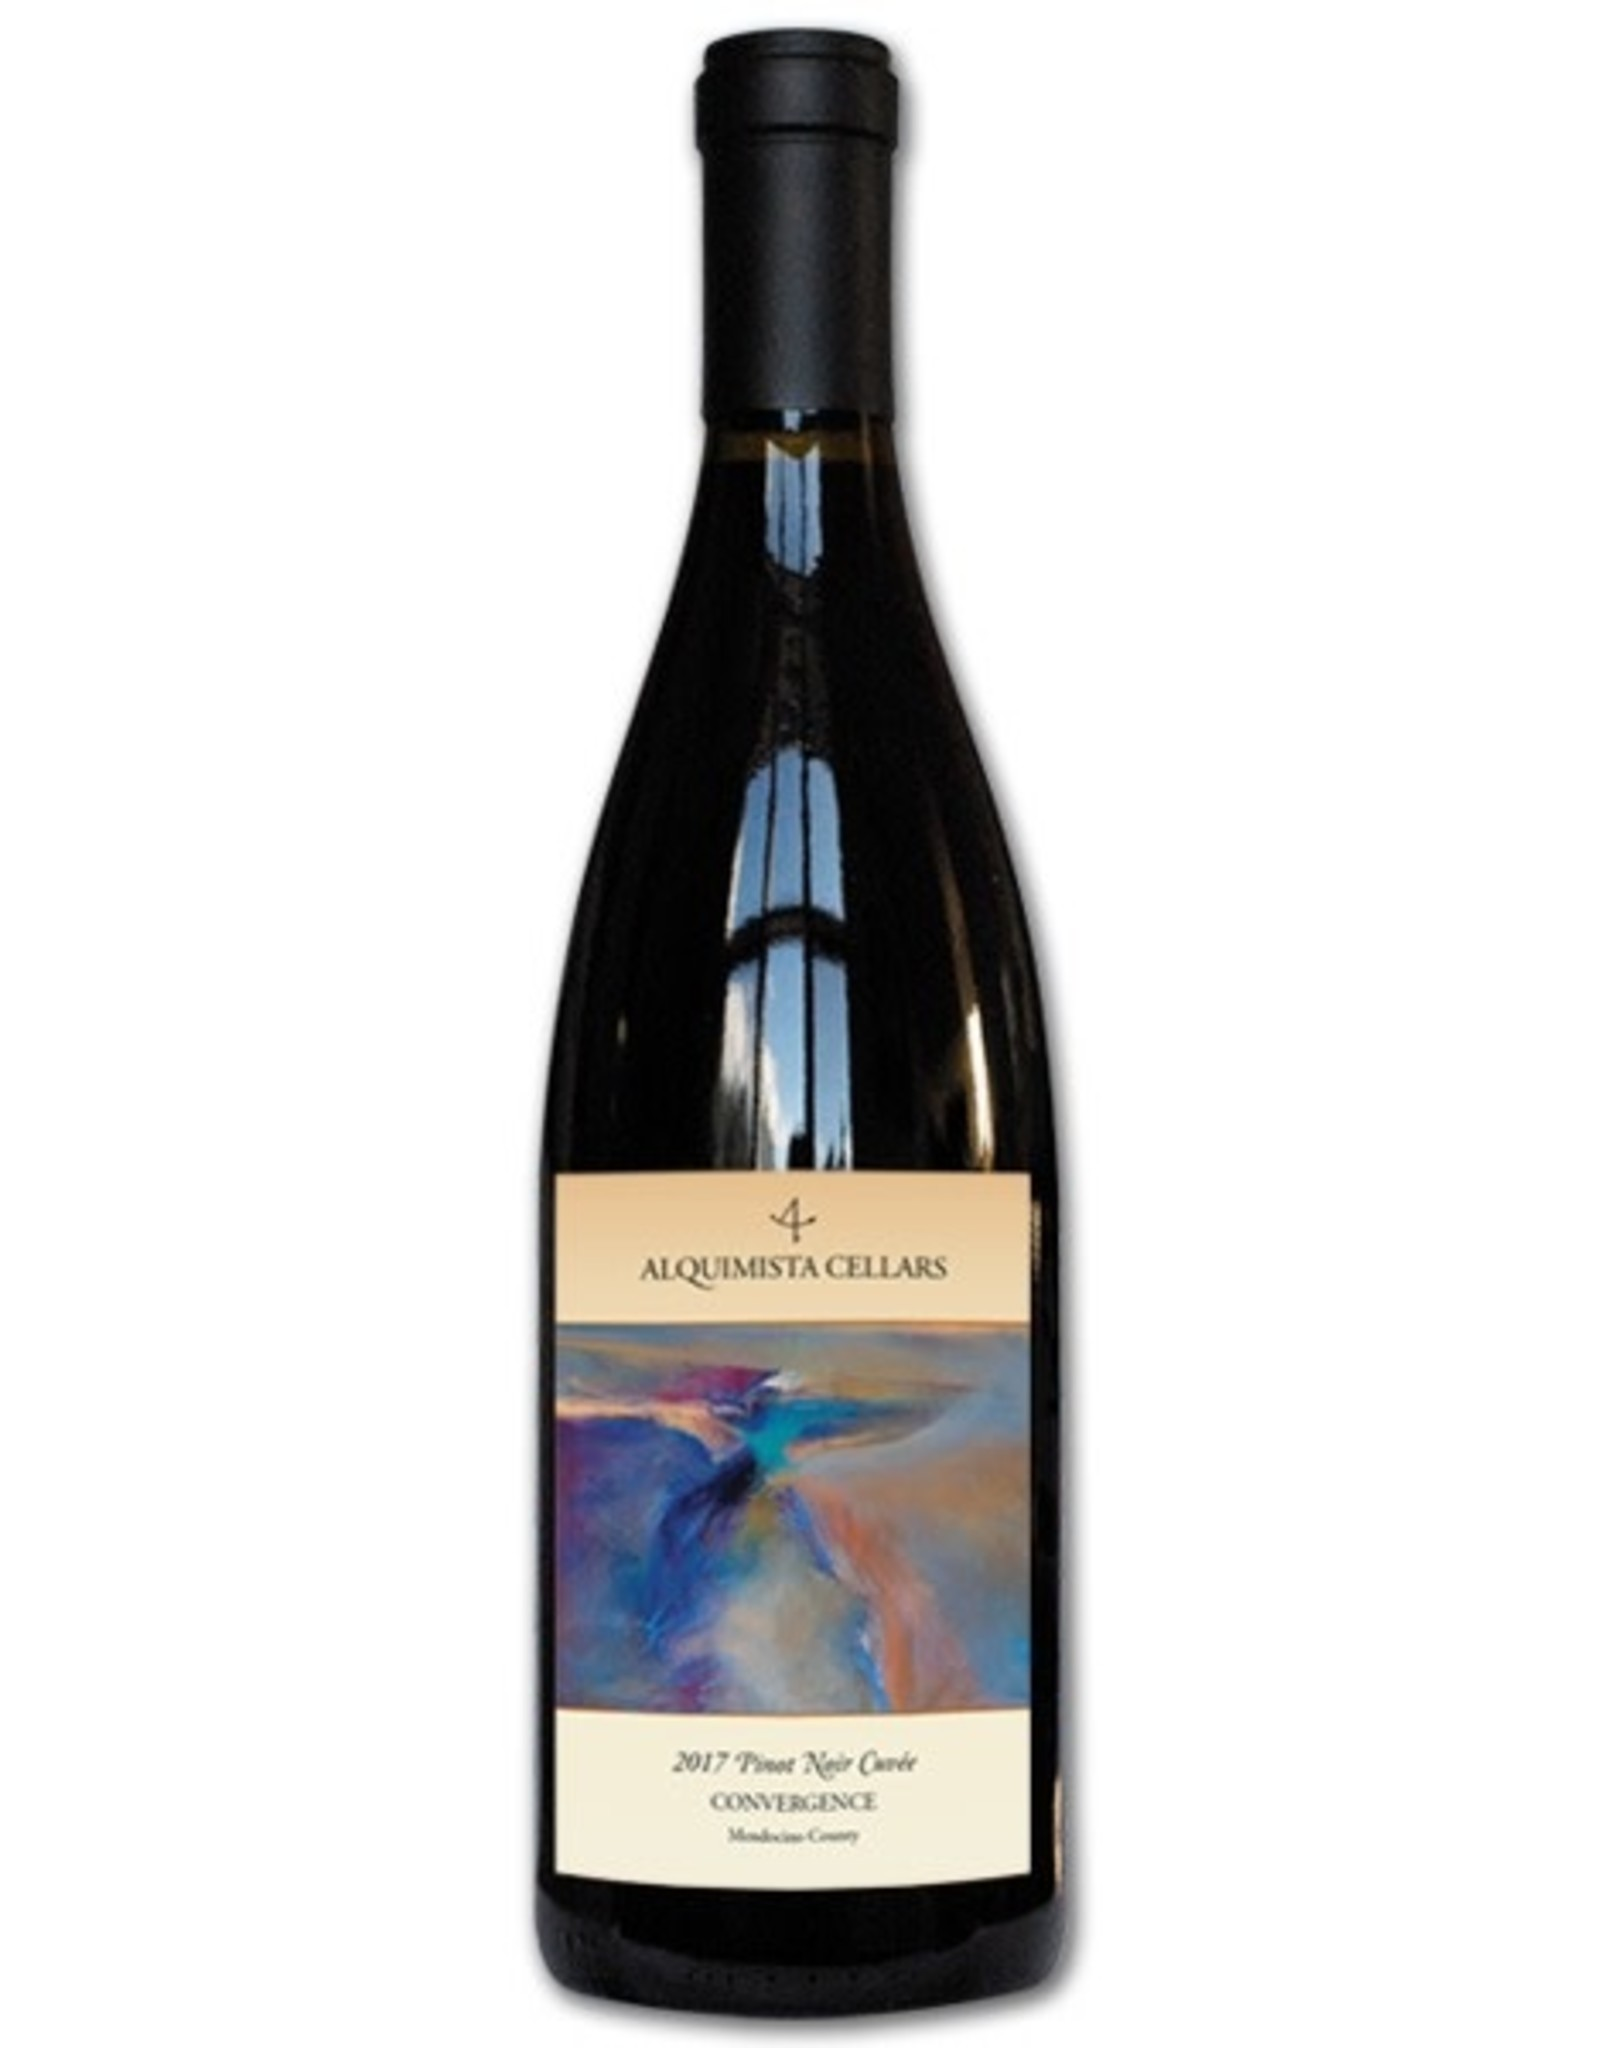 Alquimista Alquimista Cellars Convergence Pinot Noir Cuvee, Mendocino County 2017